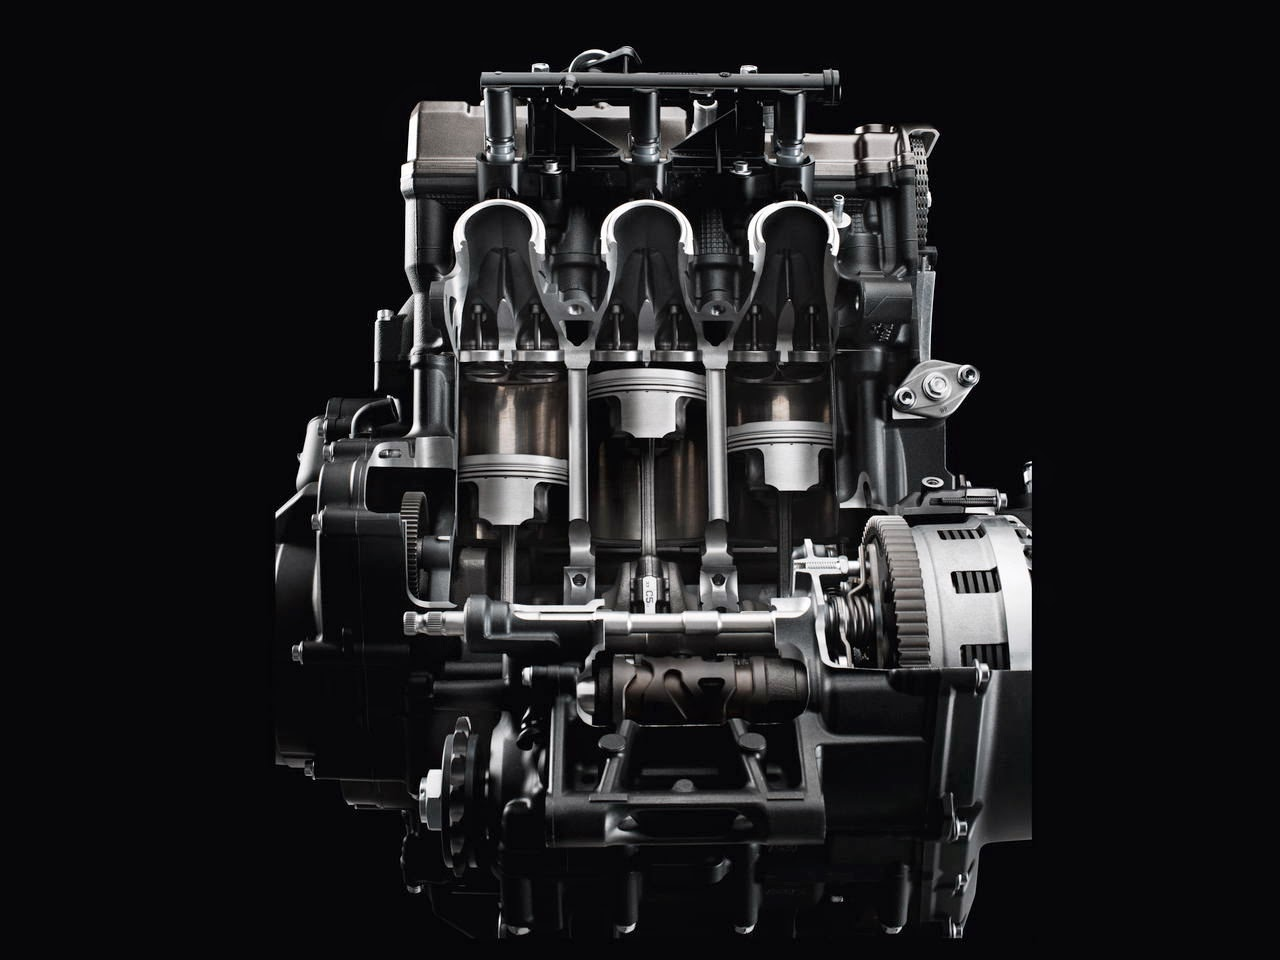 3 cylinder, triple inline, yamaha mt 09